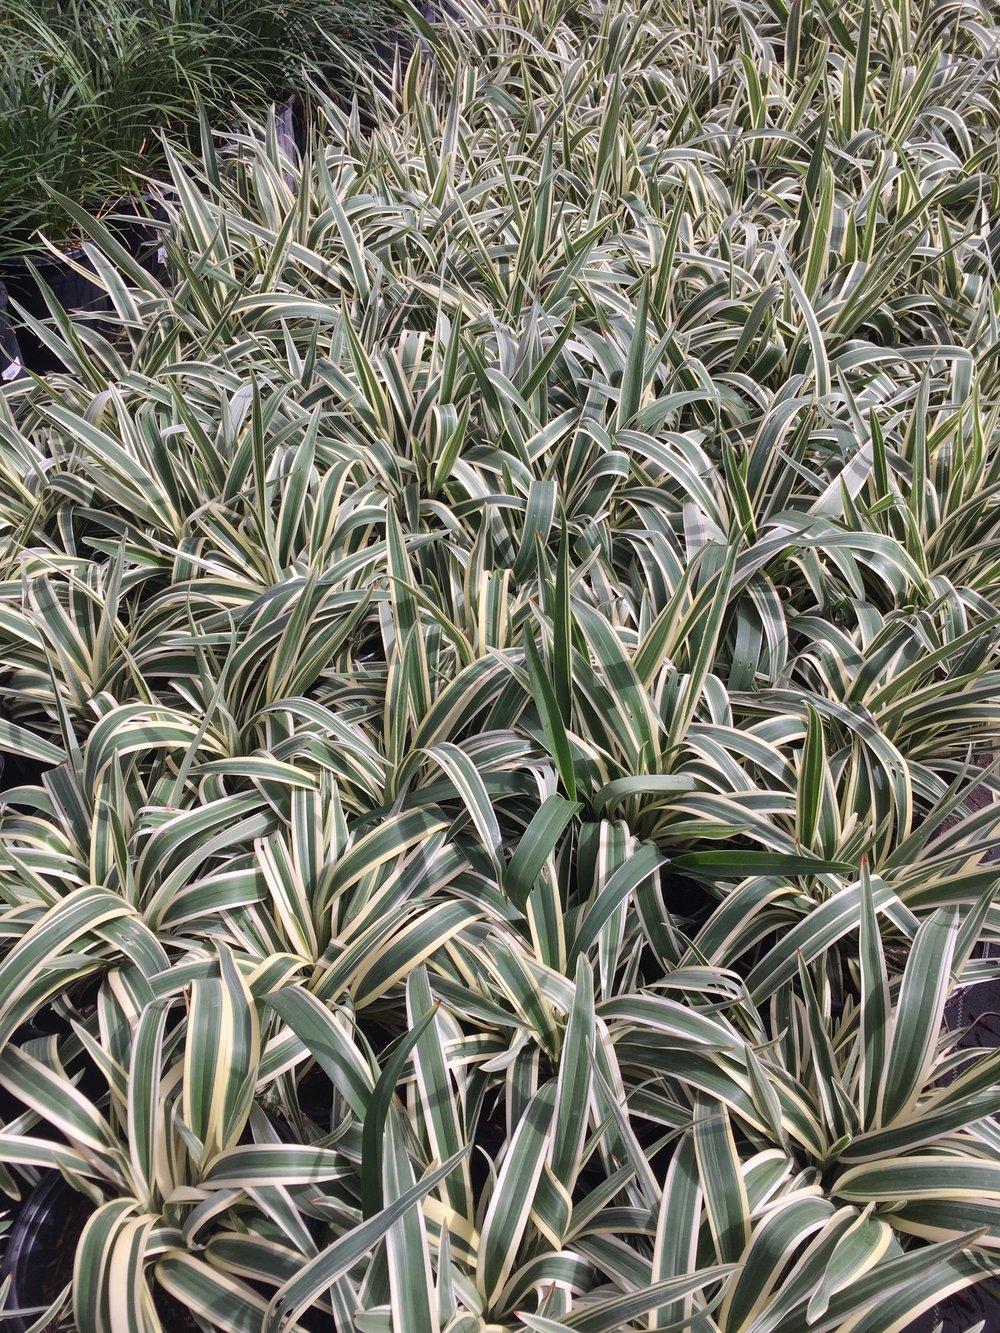 5 gal - Dianella tasmanica 'Variegata' - Variegated Flax Lily